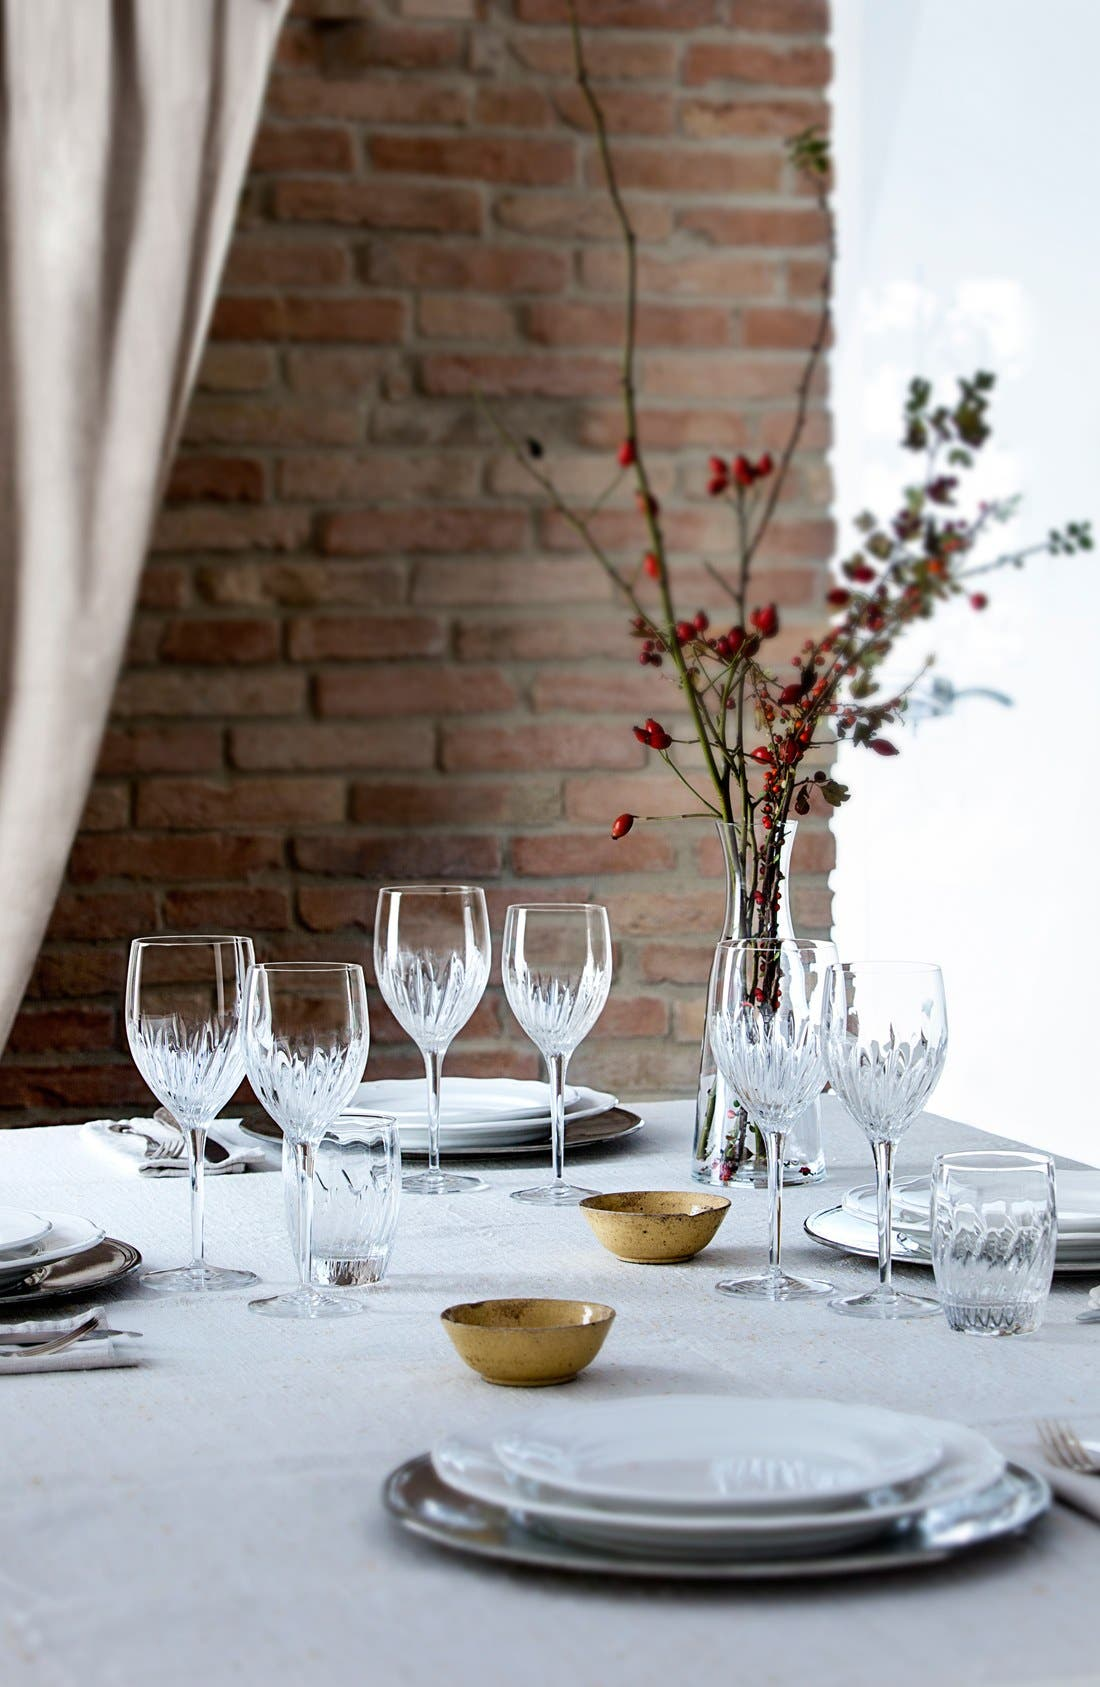 Incanto Set of 4 White Wine Glasses,                             Alternate thumbnail 2, color,                             000